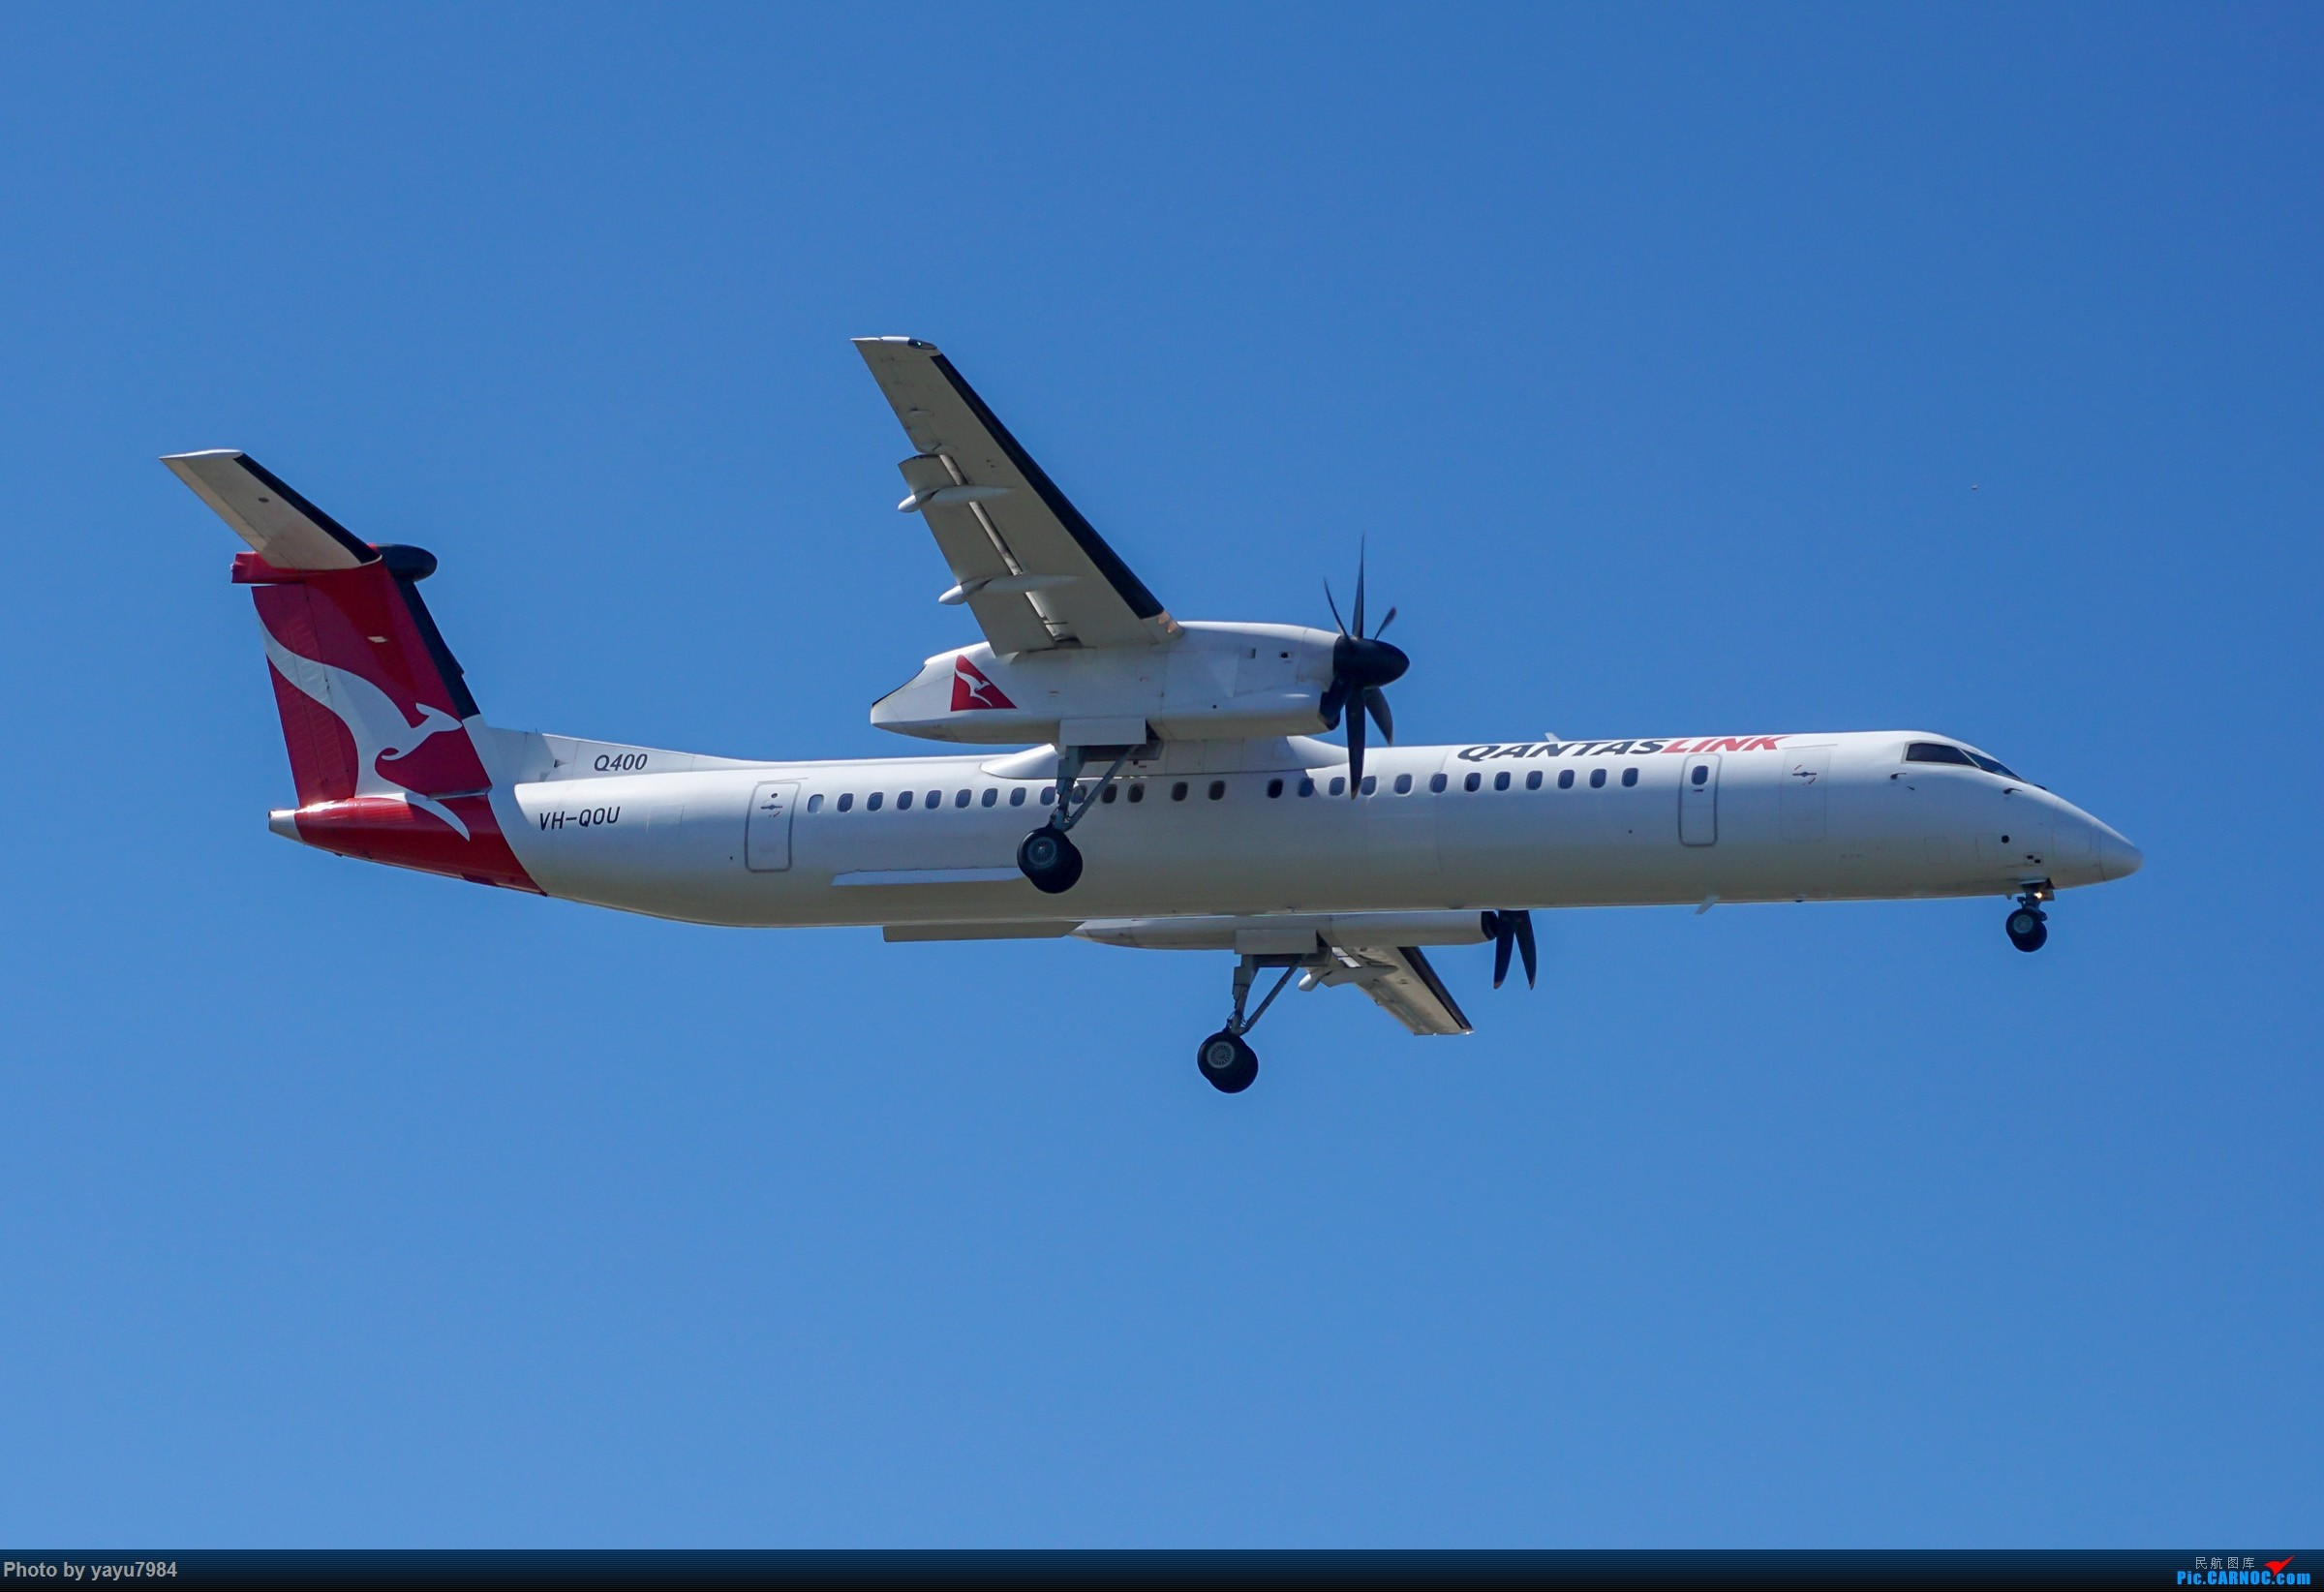 Re:[原创][SYD] 东航天合332,雪绒花343,华航蓝鹊,以及其他日常货 DE HAVILLAND CANADA DHC-8-400 VH-QOU 澳大利亚悉尼金斯福德·史密斯机场